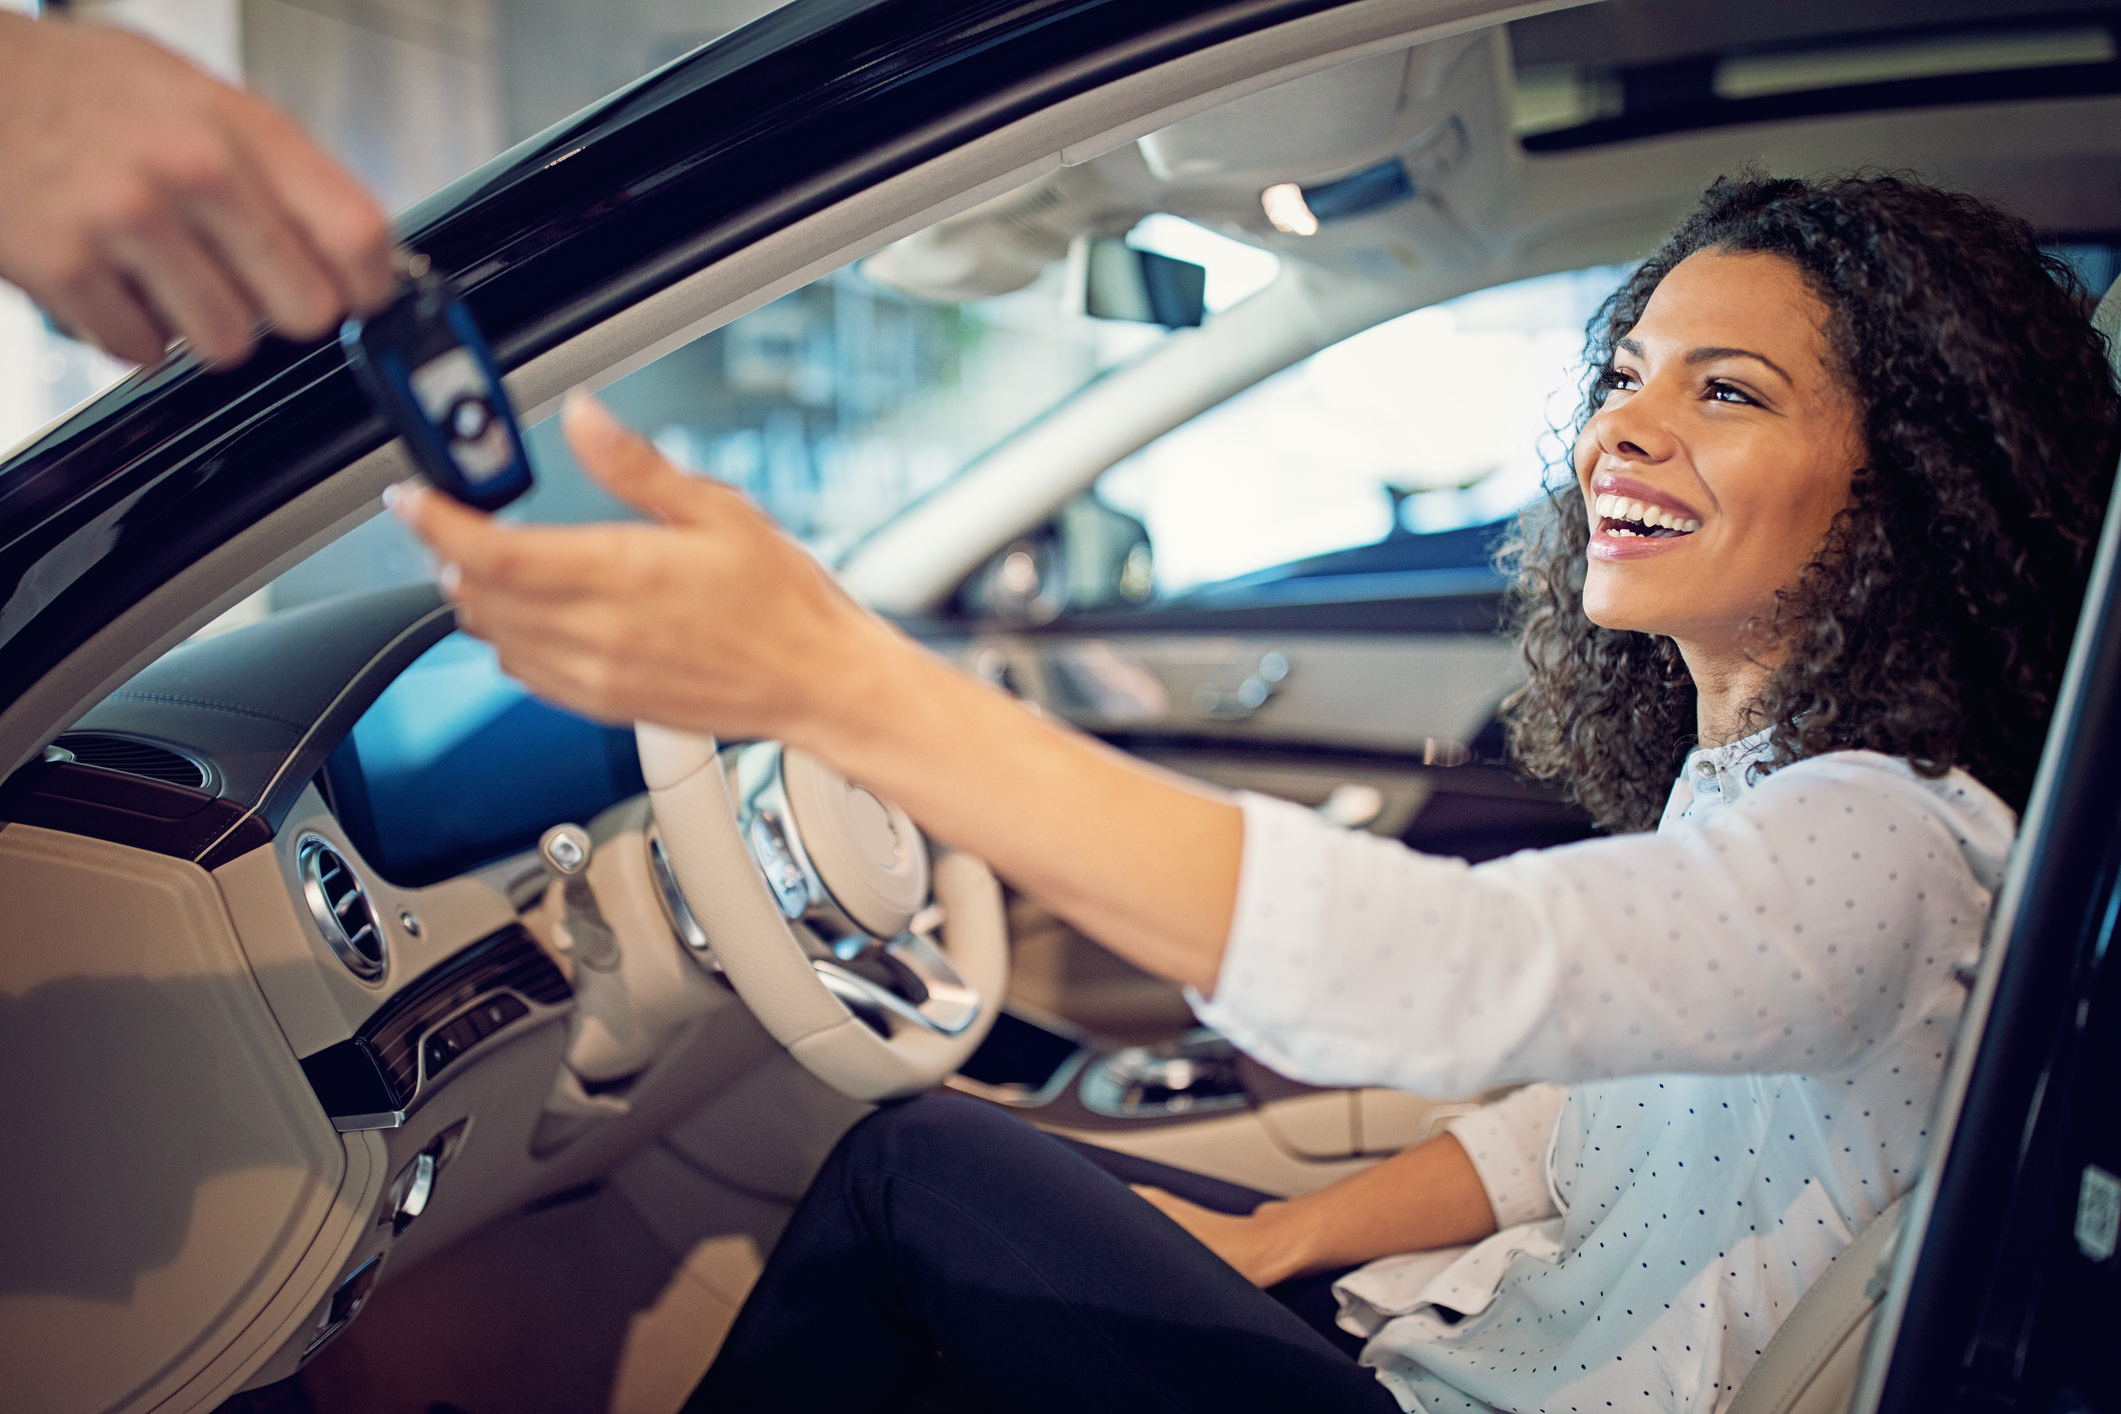 Vai comprar o primeiro carro? Sete dicas a considerar